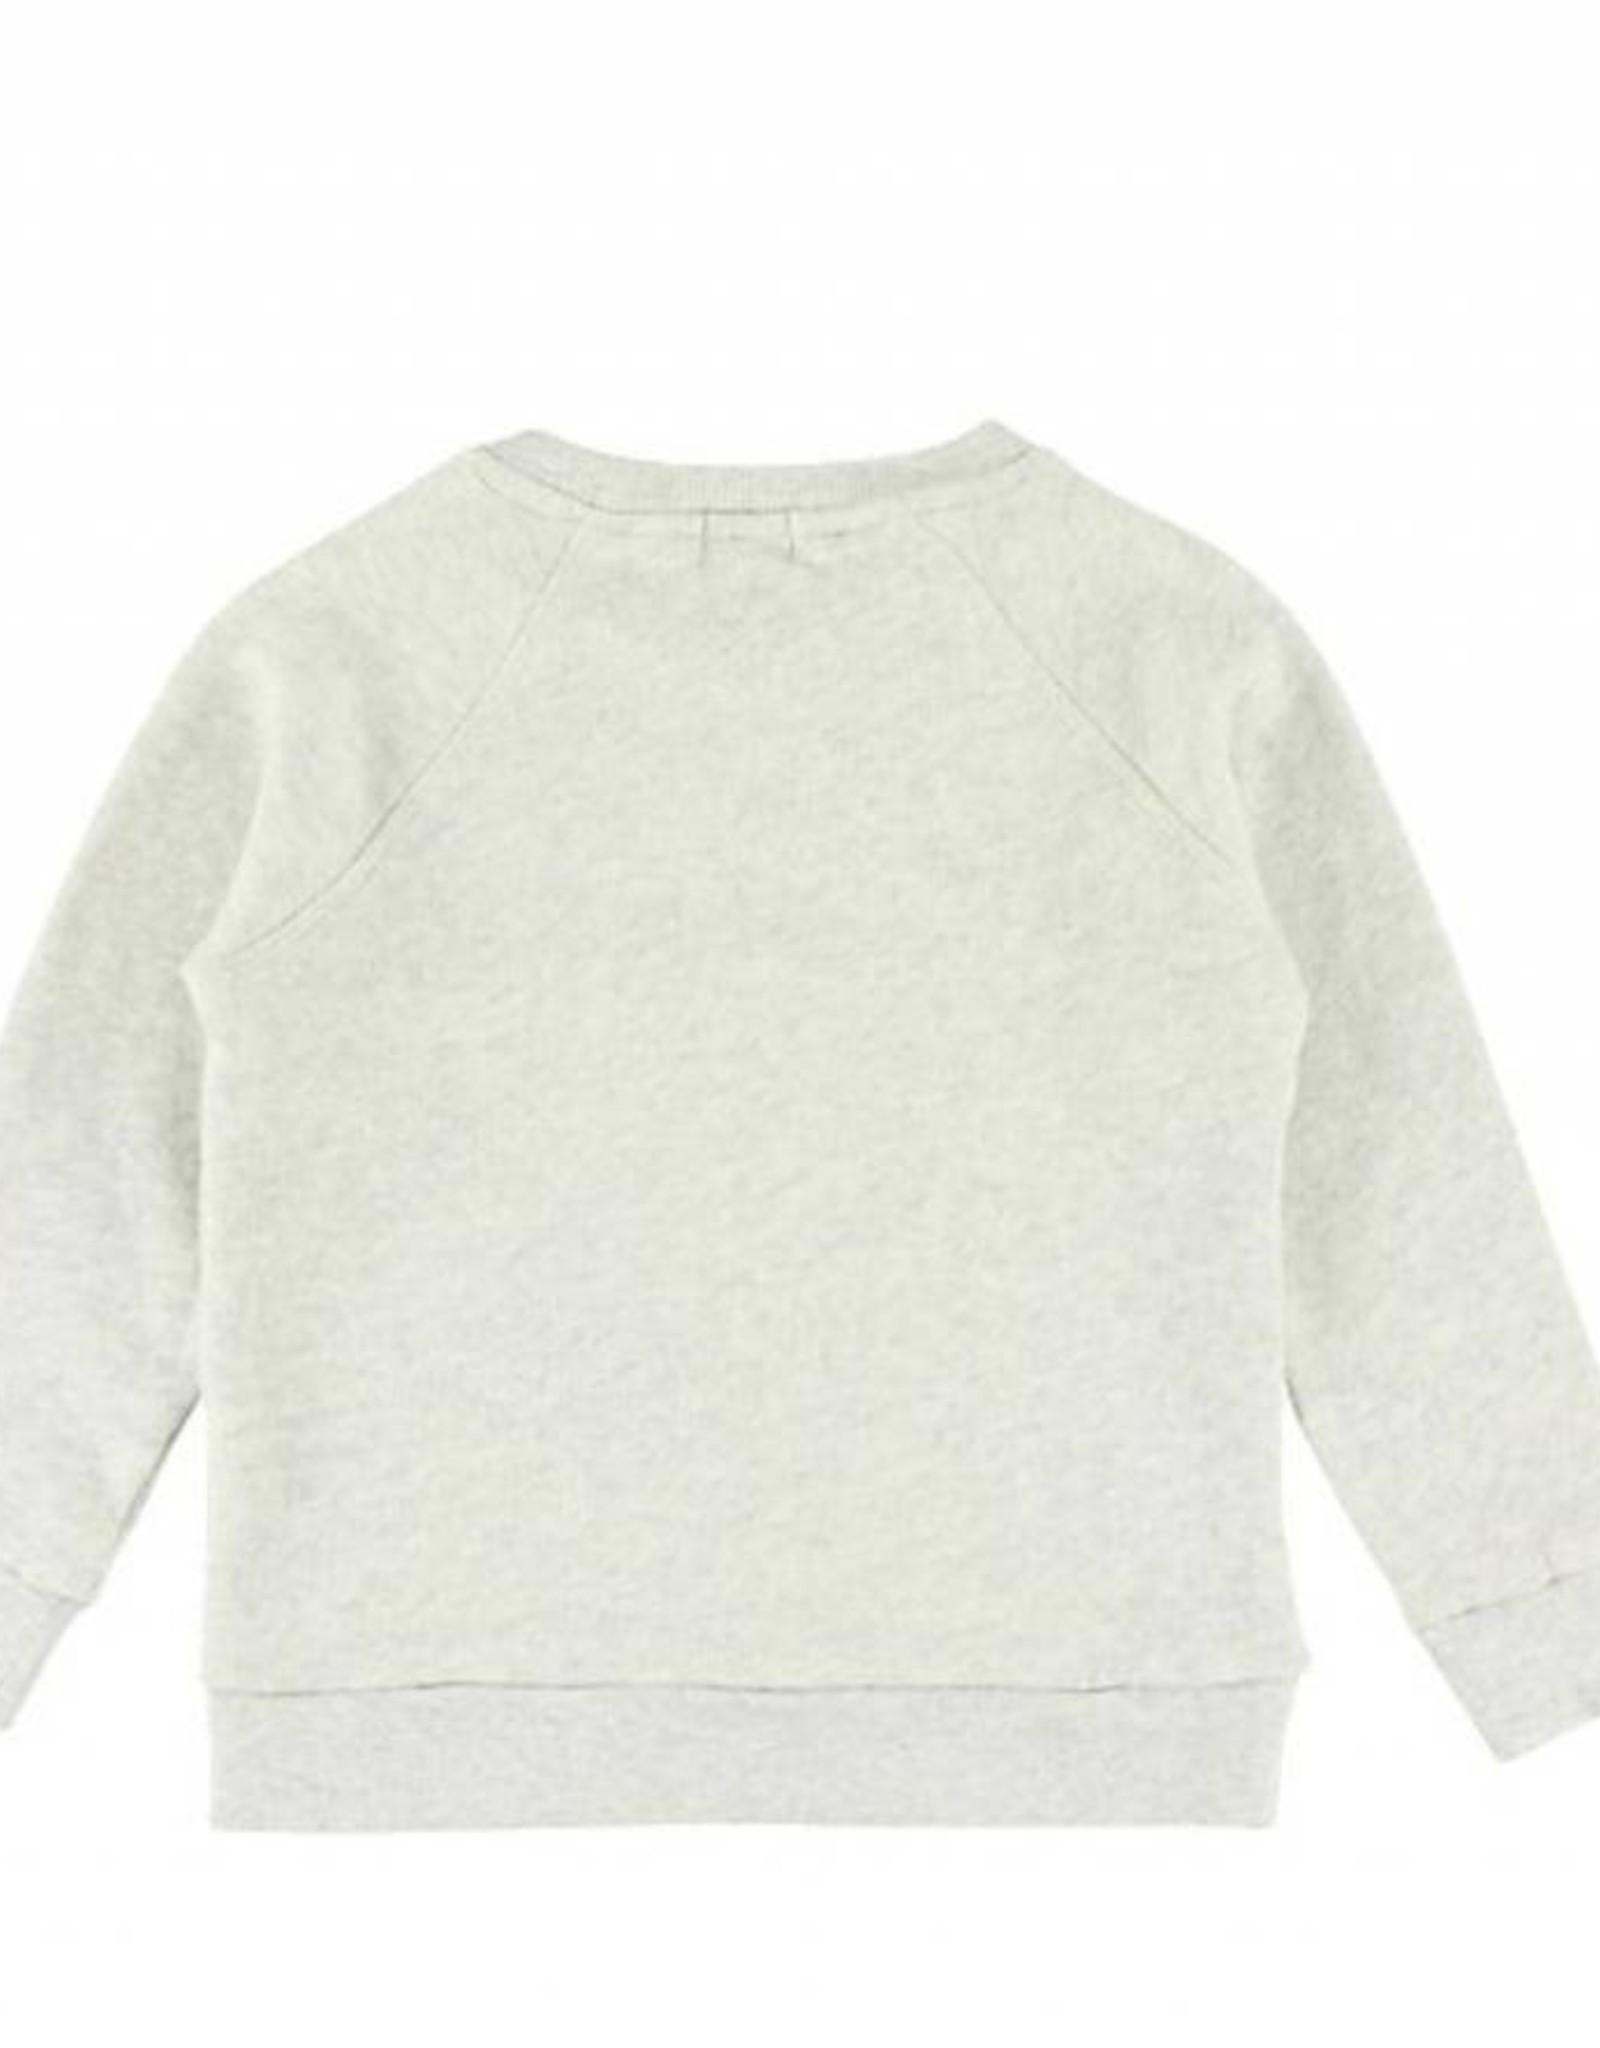 Monkey Business sweater